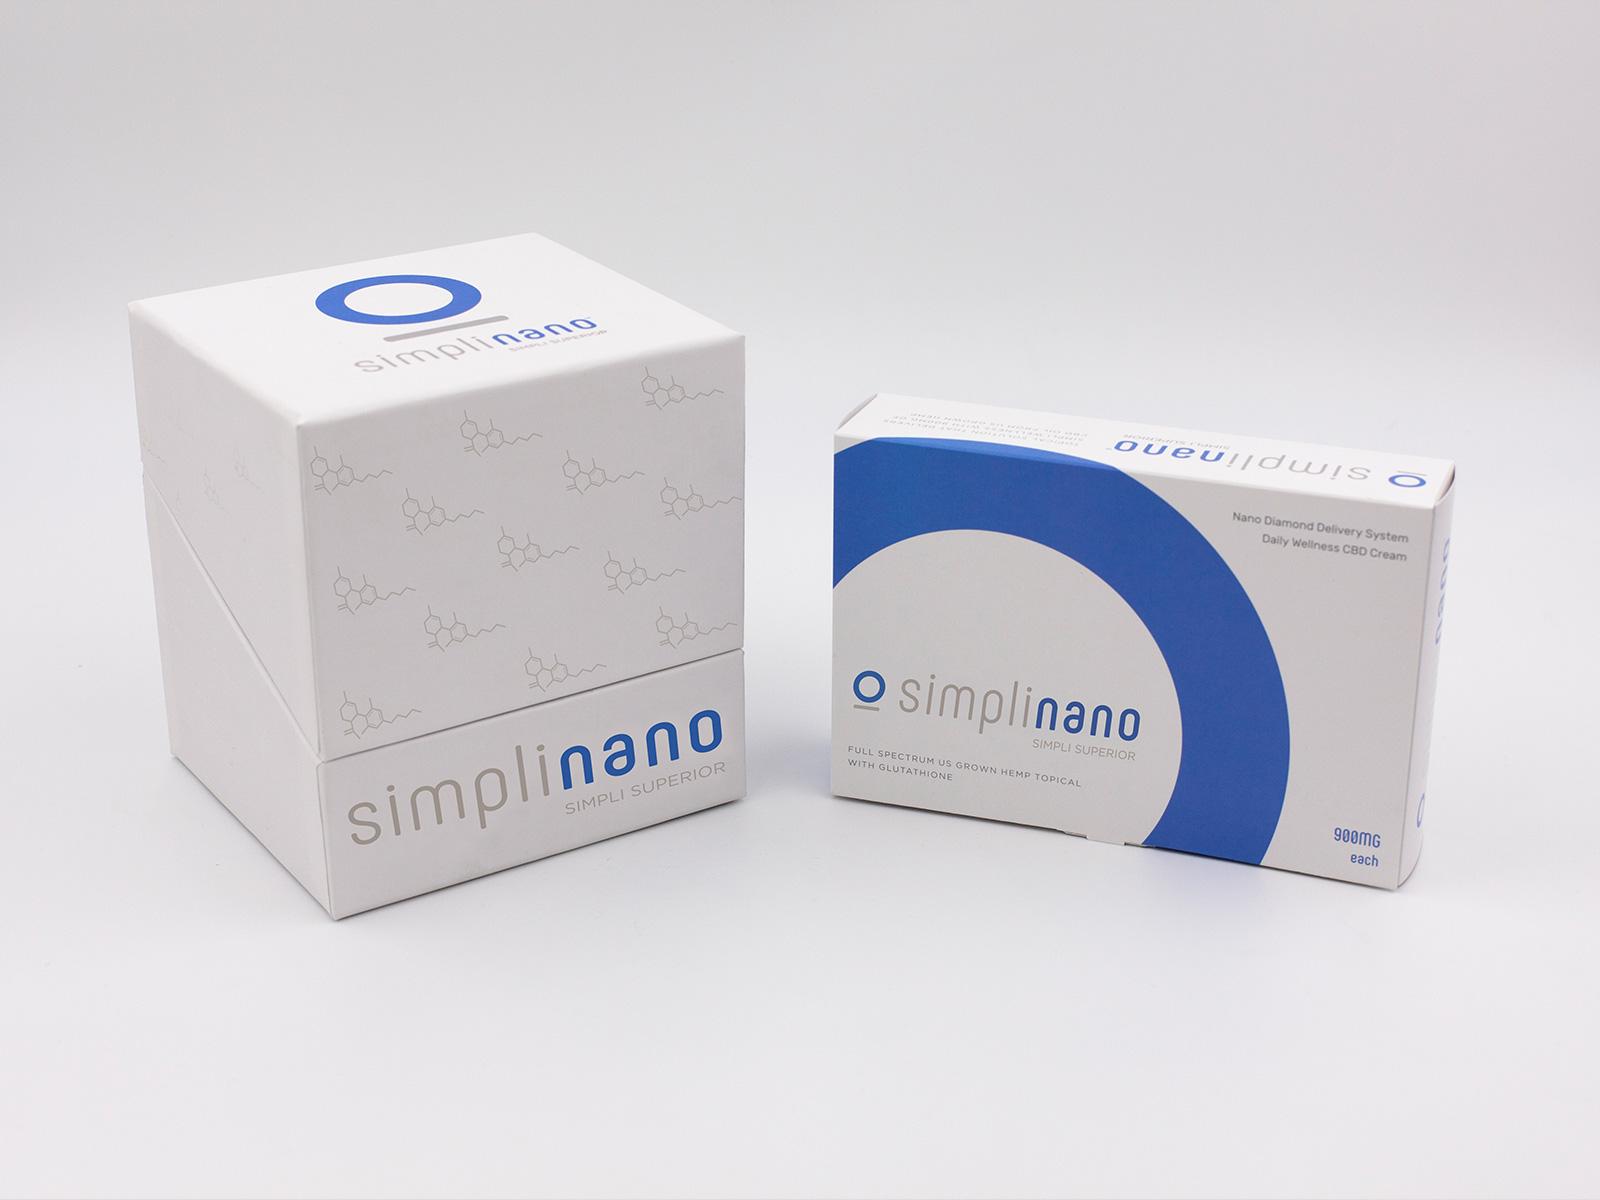 SimpliNano Tiered Packaging